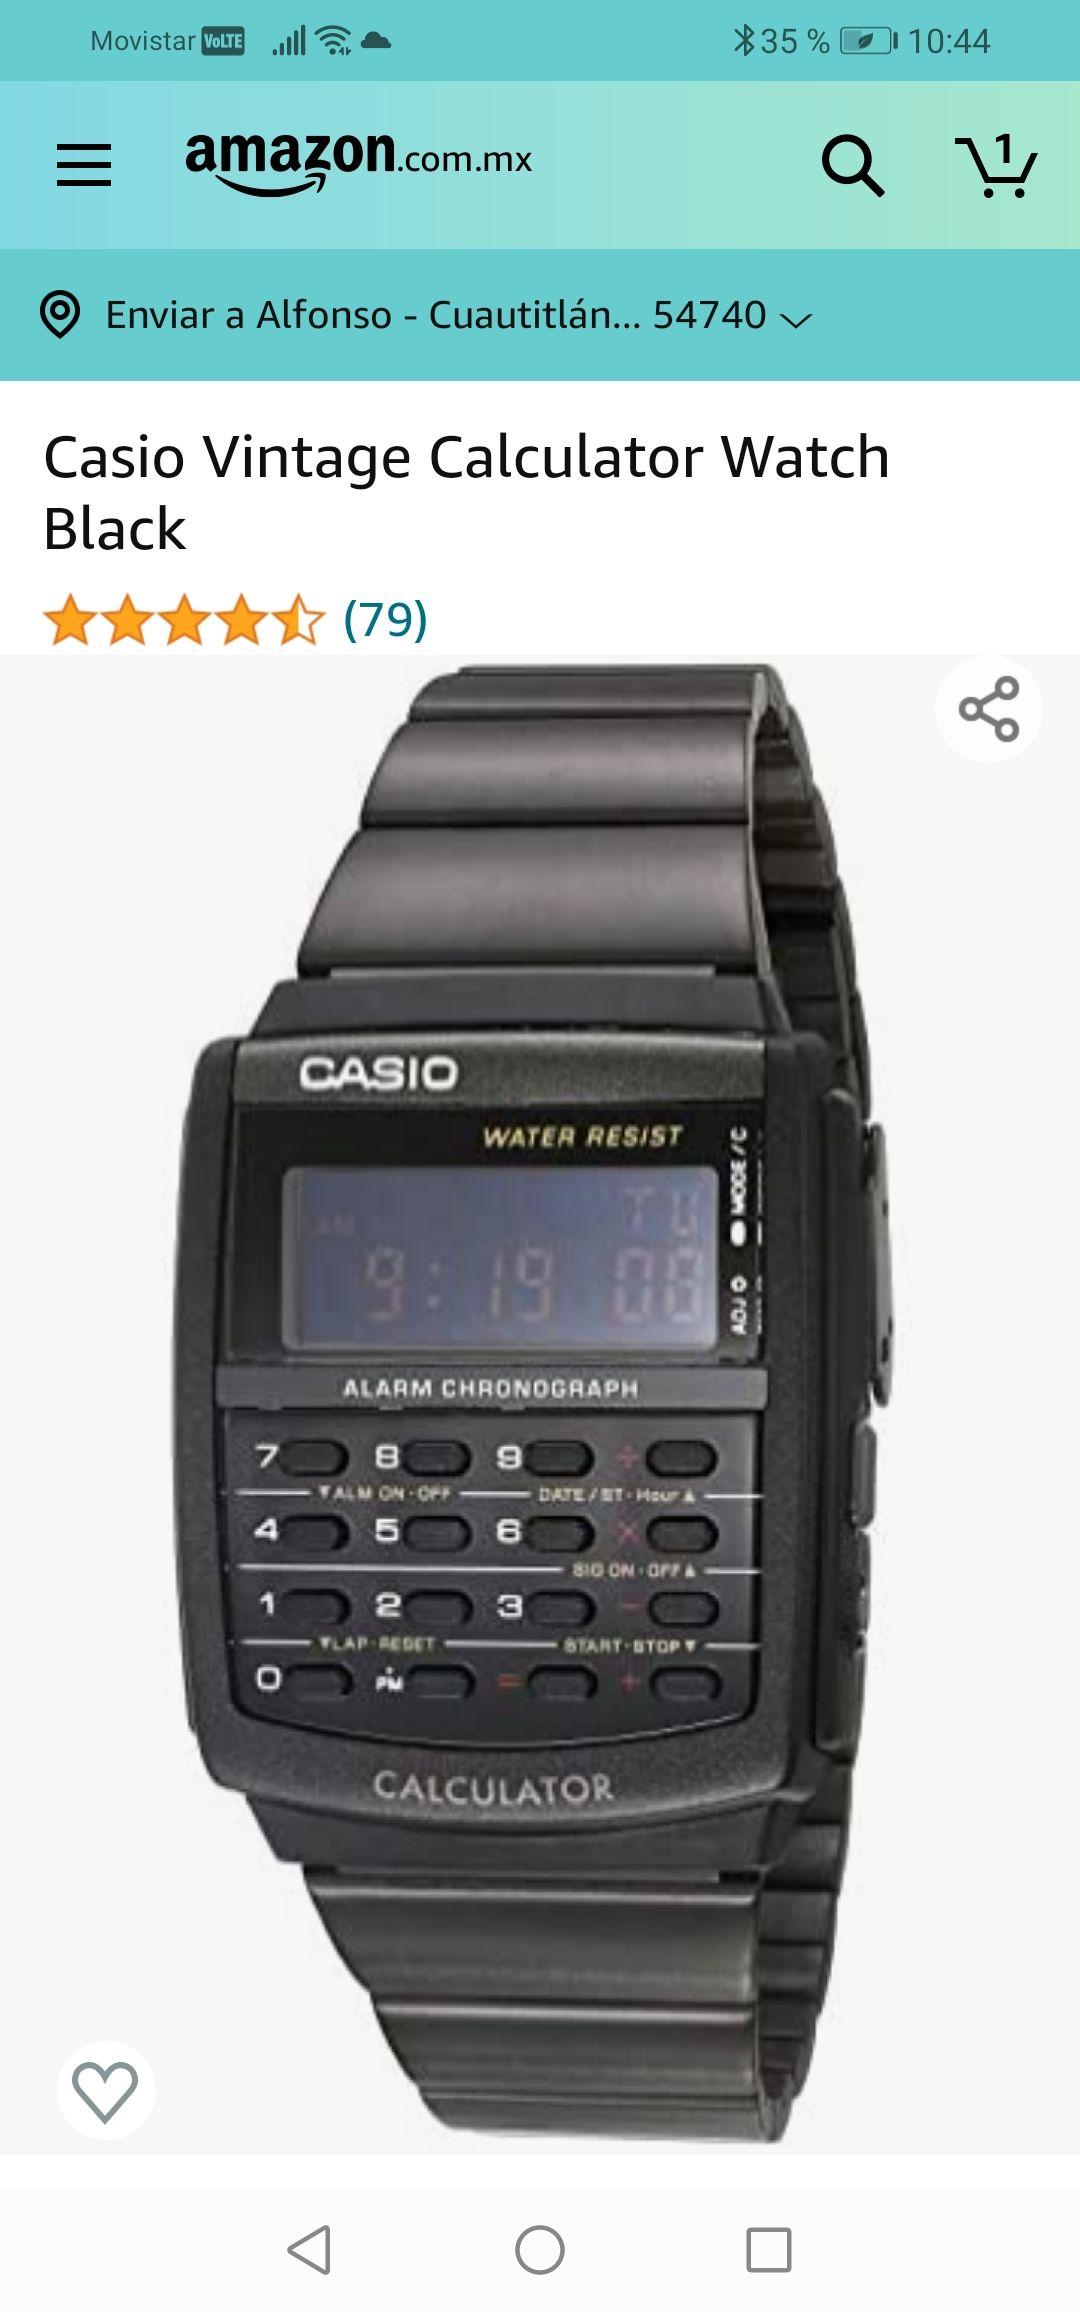 Amazon: Casio Vintage Calculator Watch Black